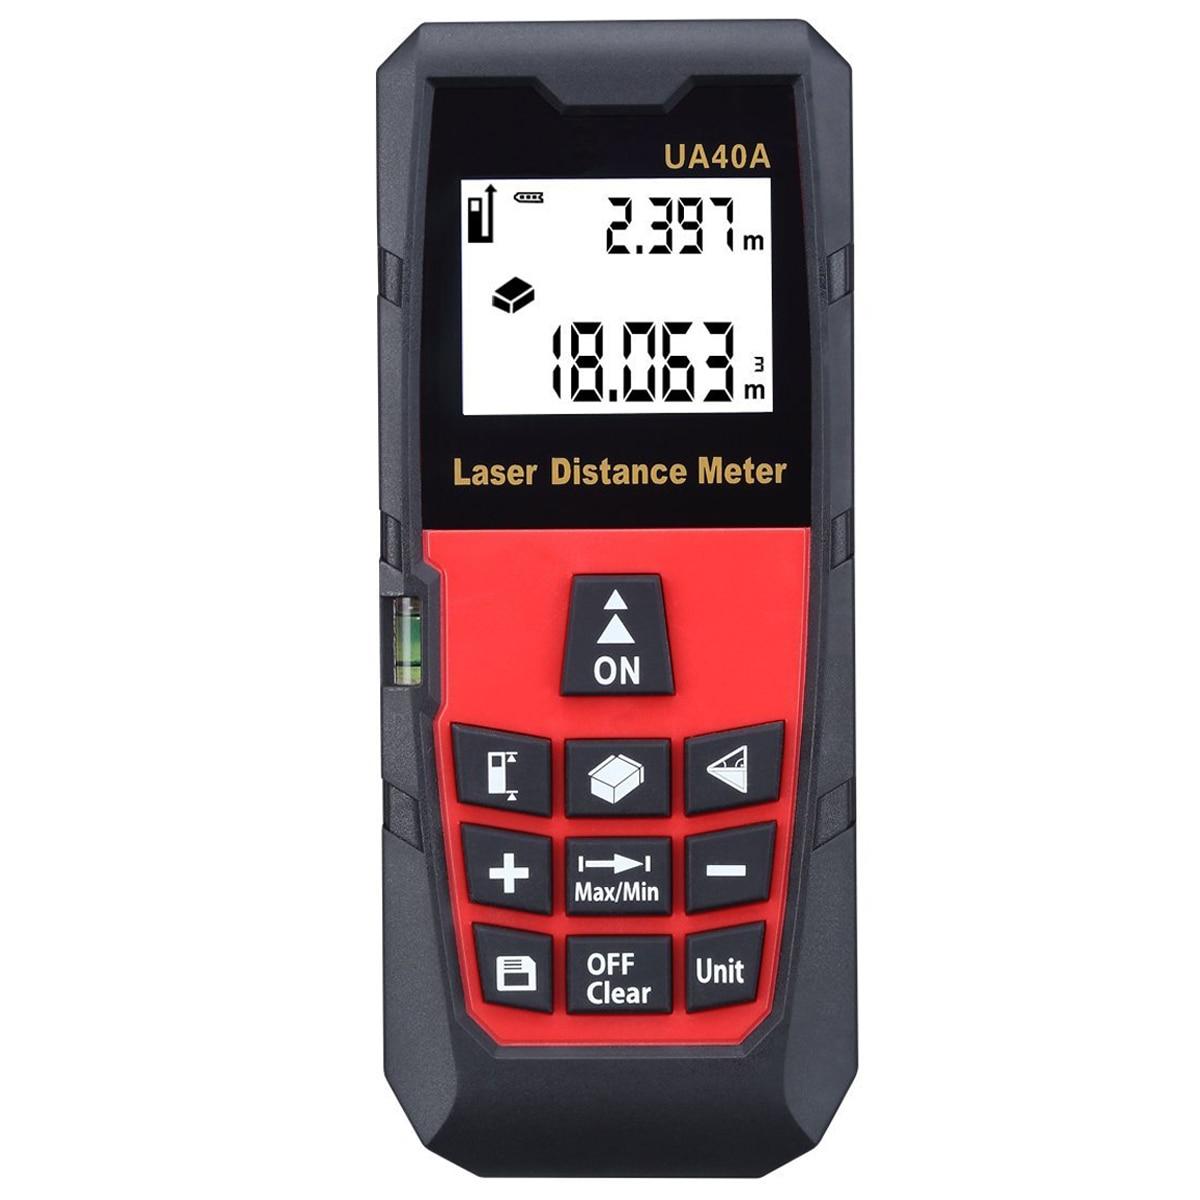 ФОТО UYIGAO 131 Feet / 40 Meter Digital Laser Distance Measure Rangefinder Meter Tape Diastimeter Large LCD with Backlight